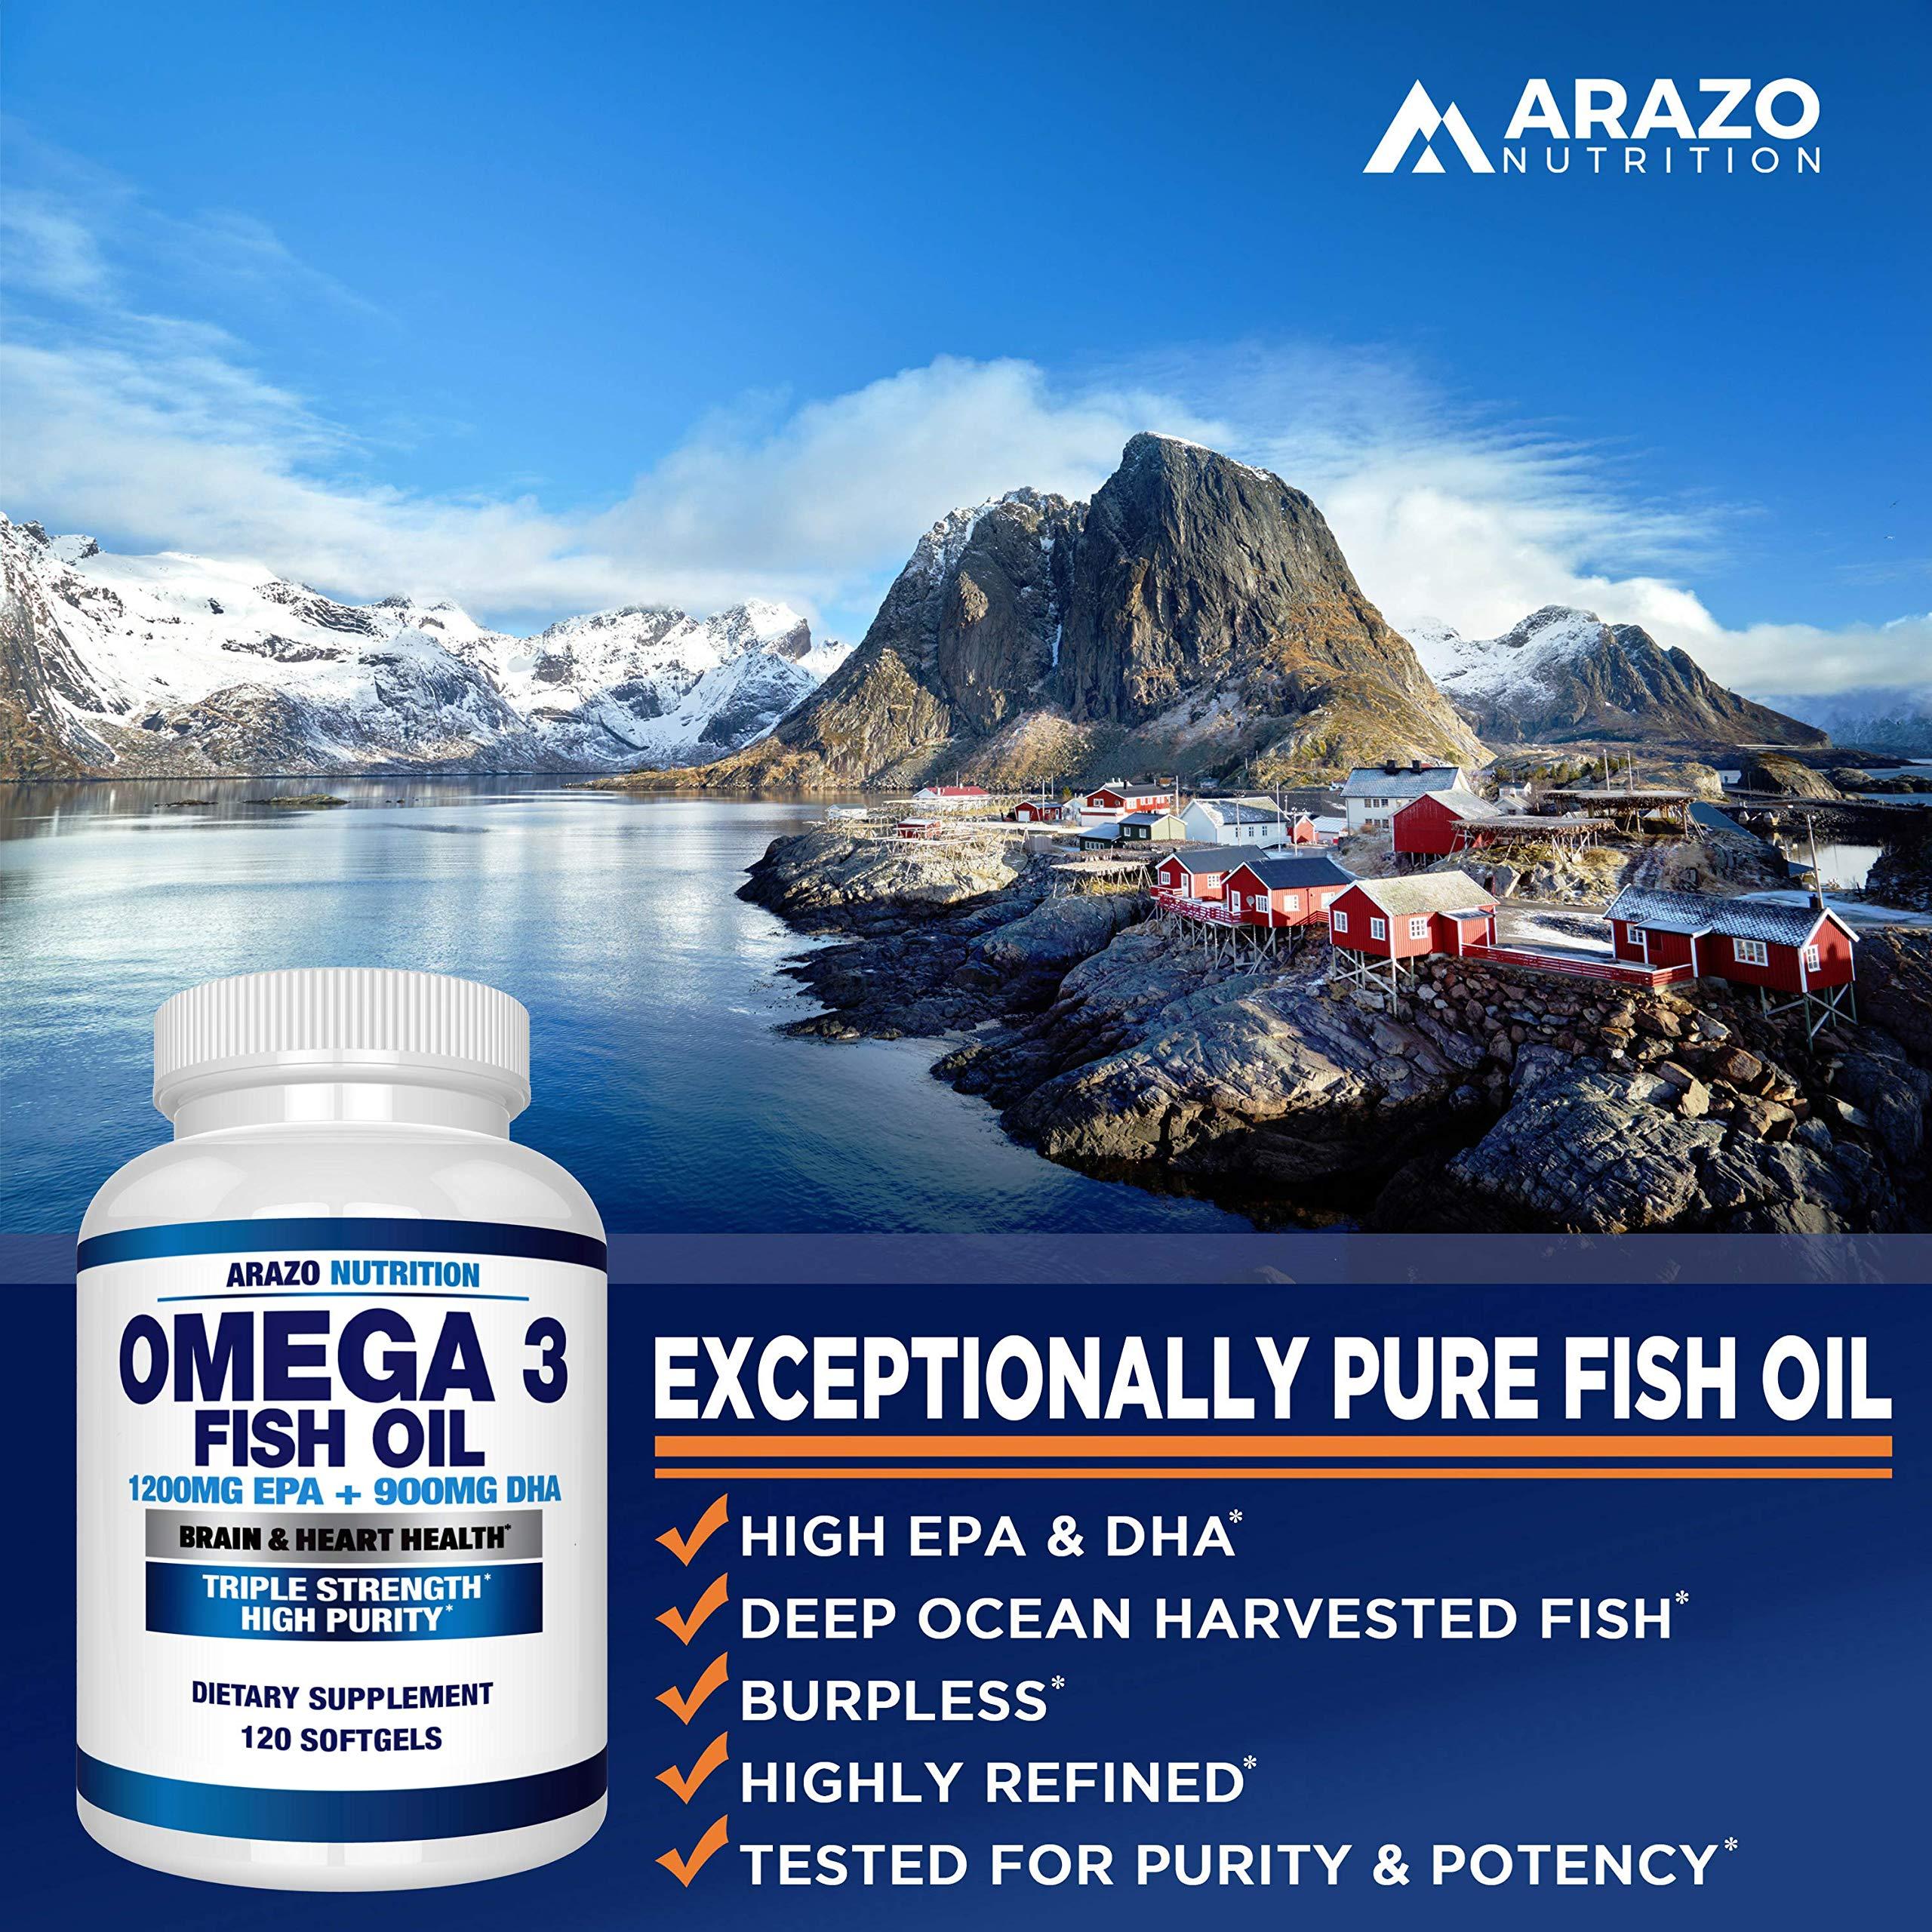 Omega 3 Fish Oil 2250mg   HIGH EPA 1200MG + DHA 900MG Triple Strength Burpless Capsules   120 Pills   Arazo Nutrition by Arazo Nutrition (Image #4)